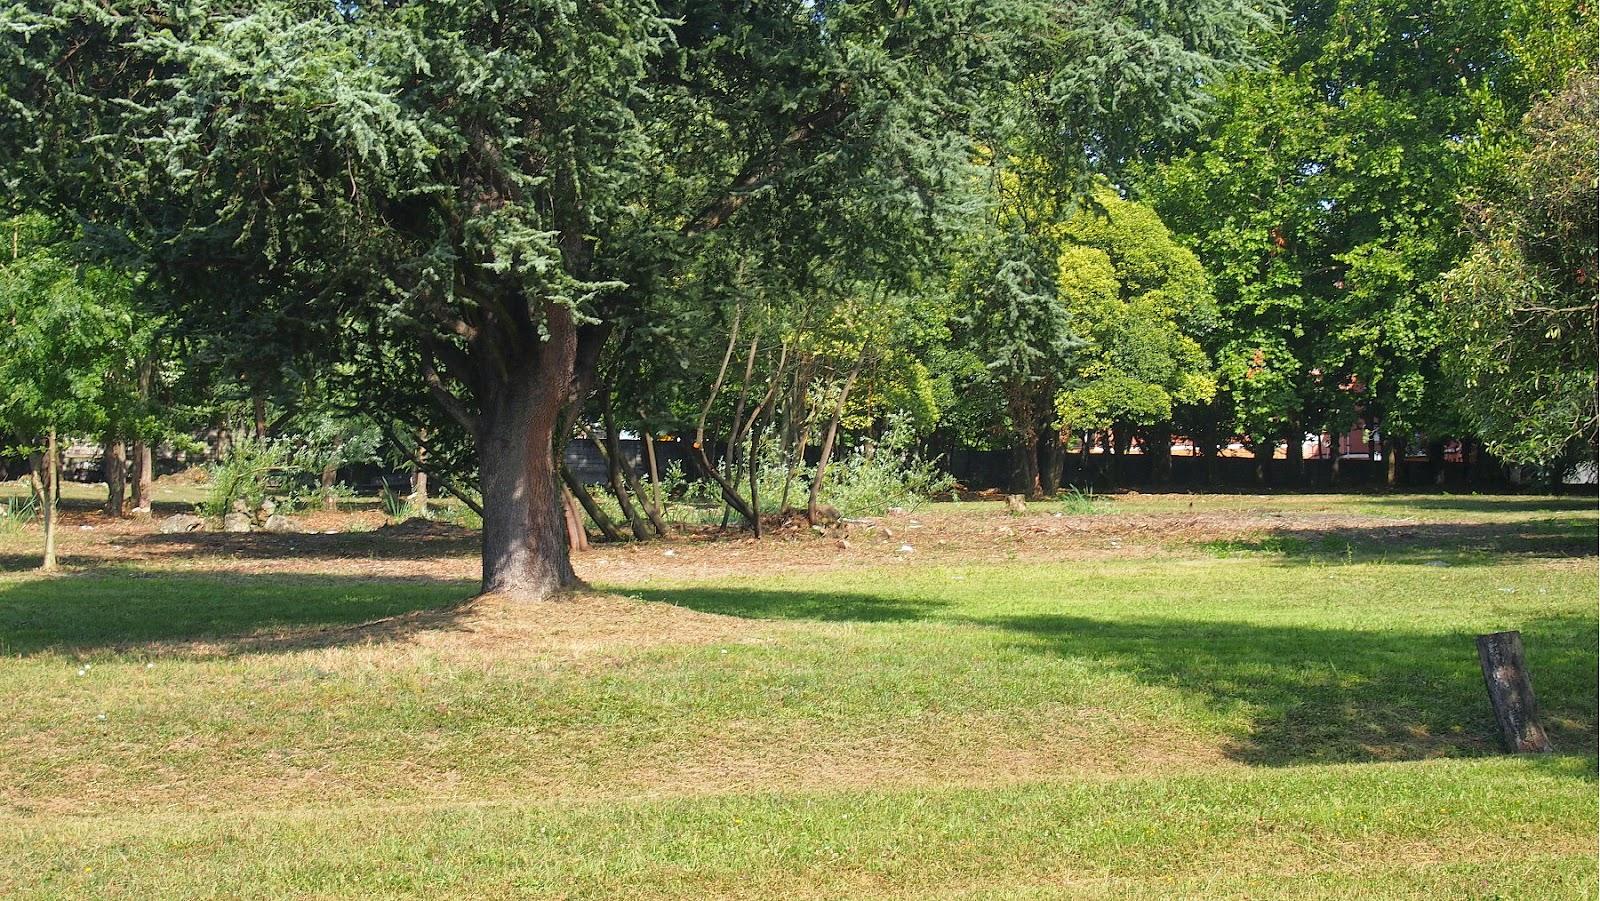 La finca Munoa en verano de 2014